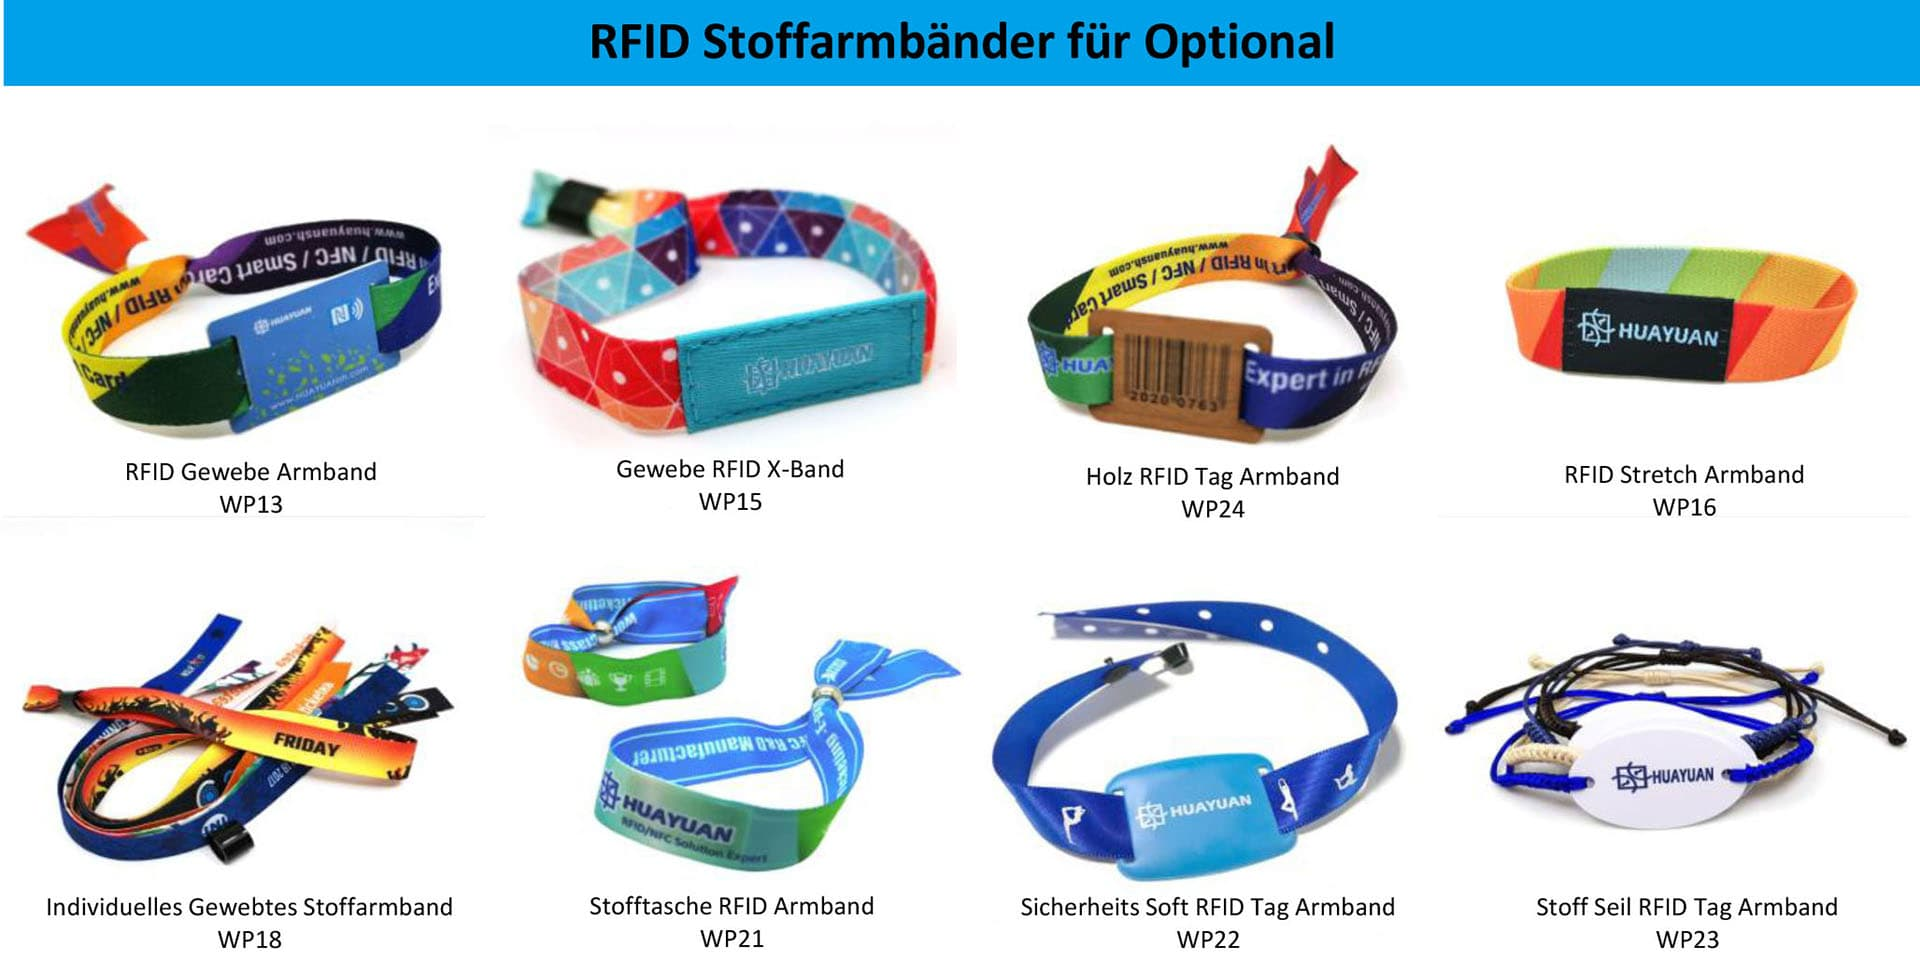 RFID Stoffarmbänder für optional